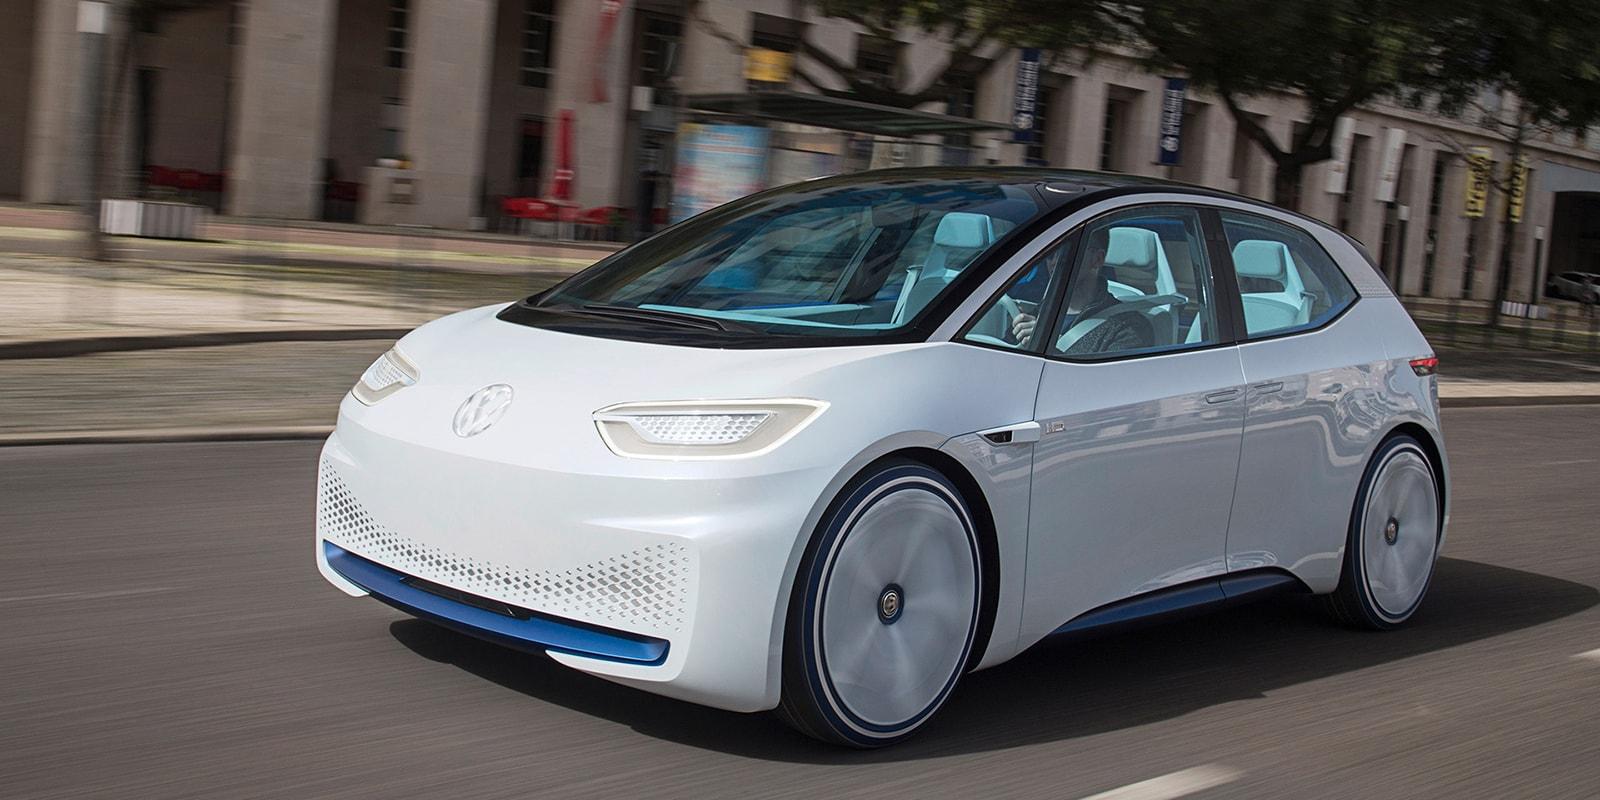 Volkswagen hochet stat liderom v segmente elektrokarov